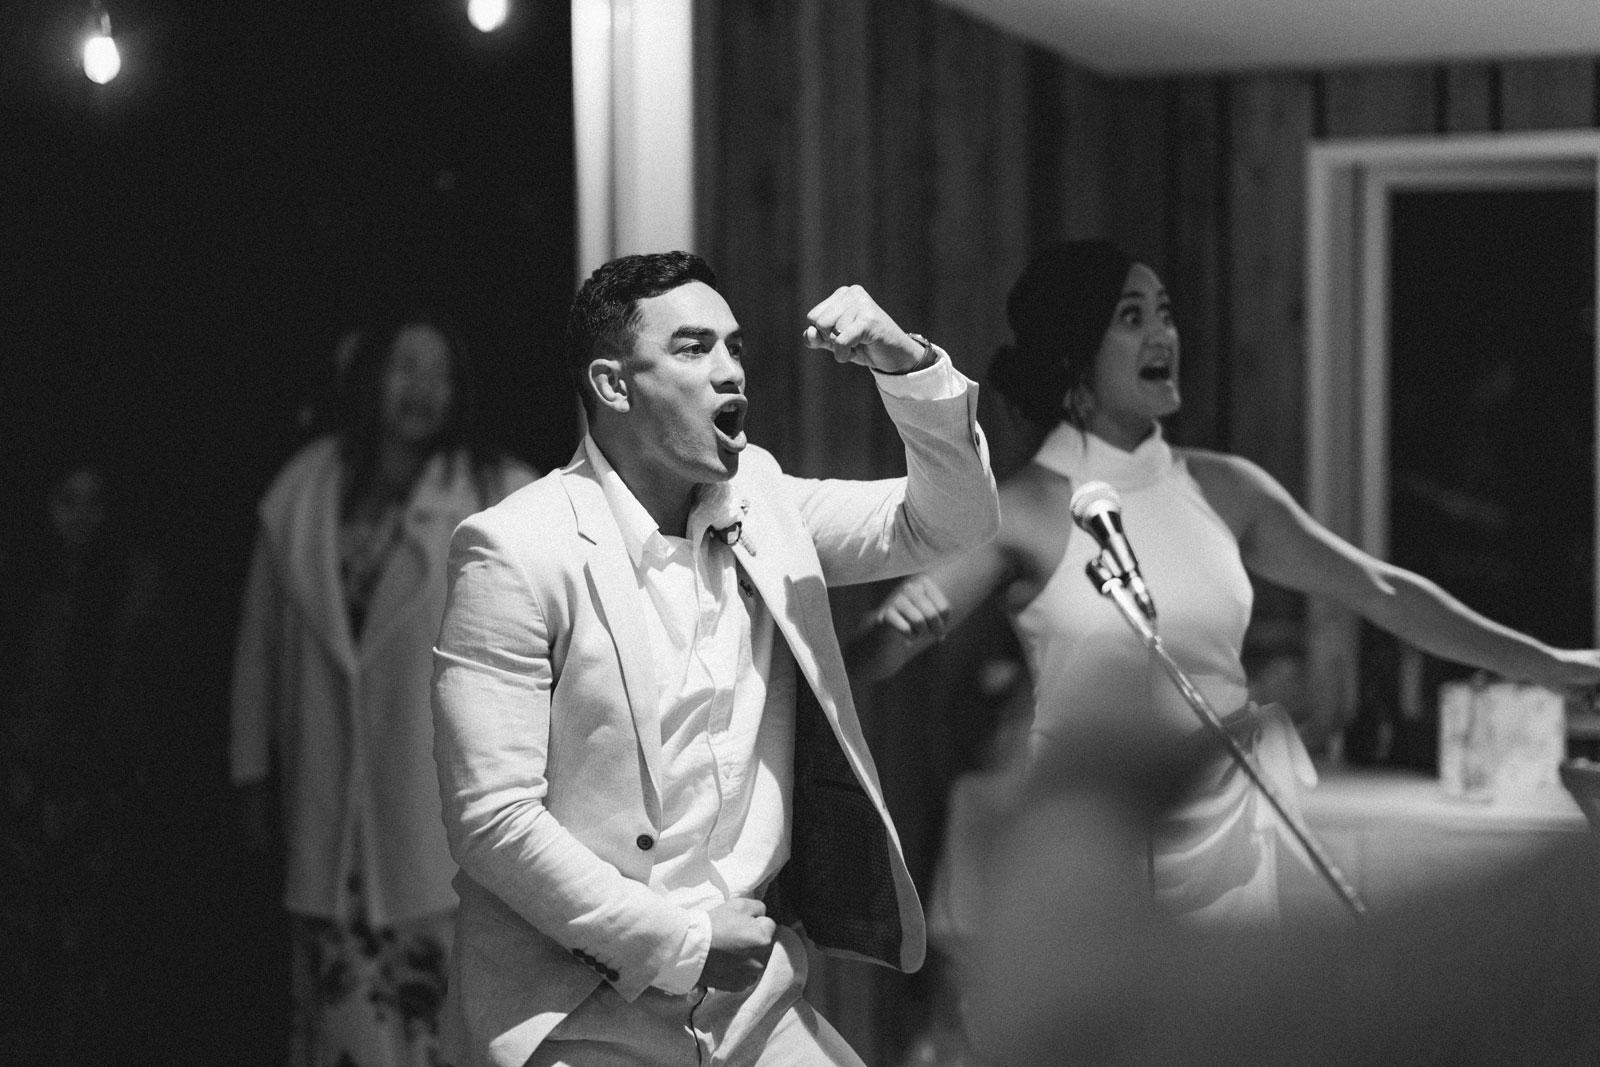 newfound-n-w-black-barn-tarawera-rotorua-wedding-photographer-1082